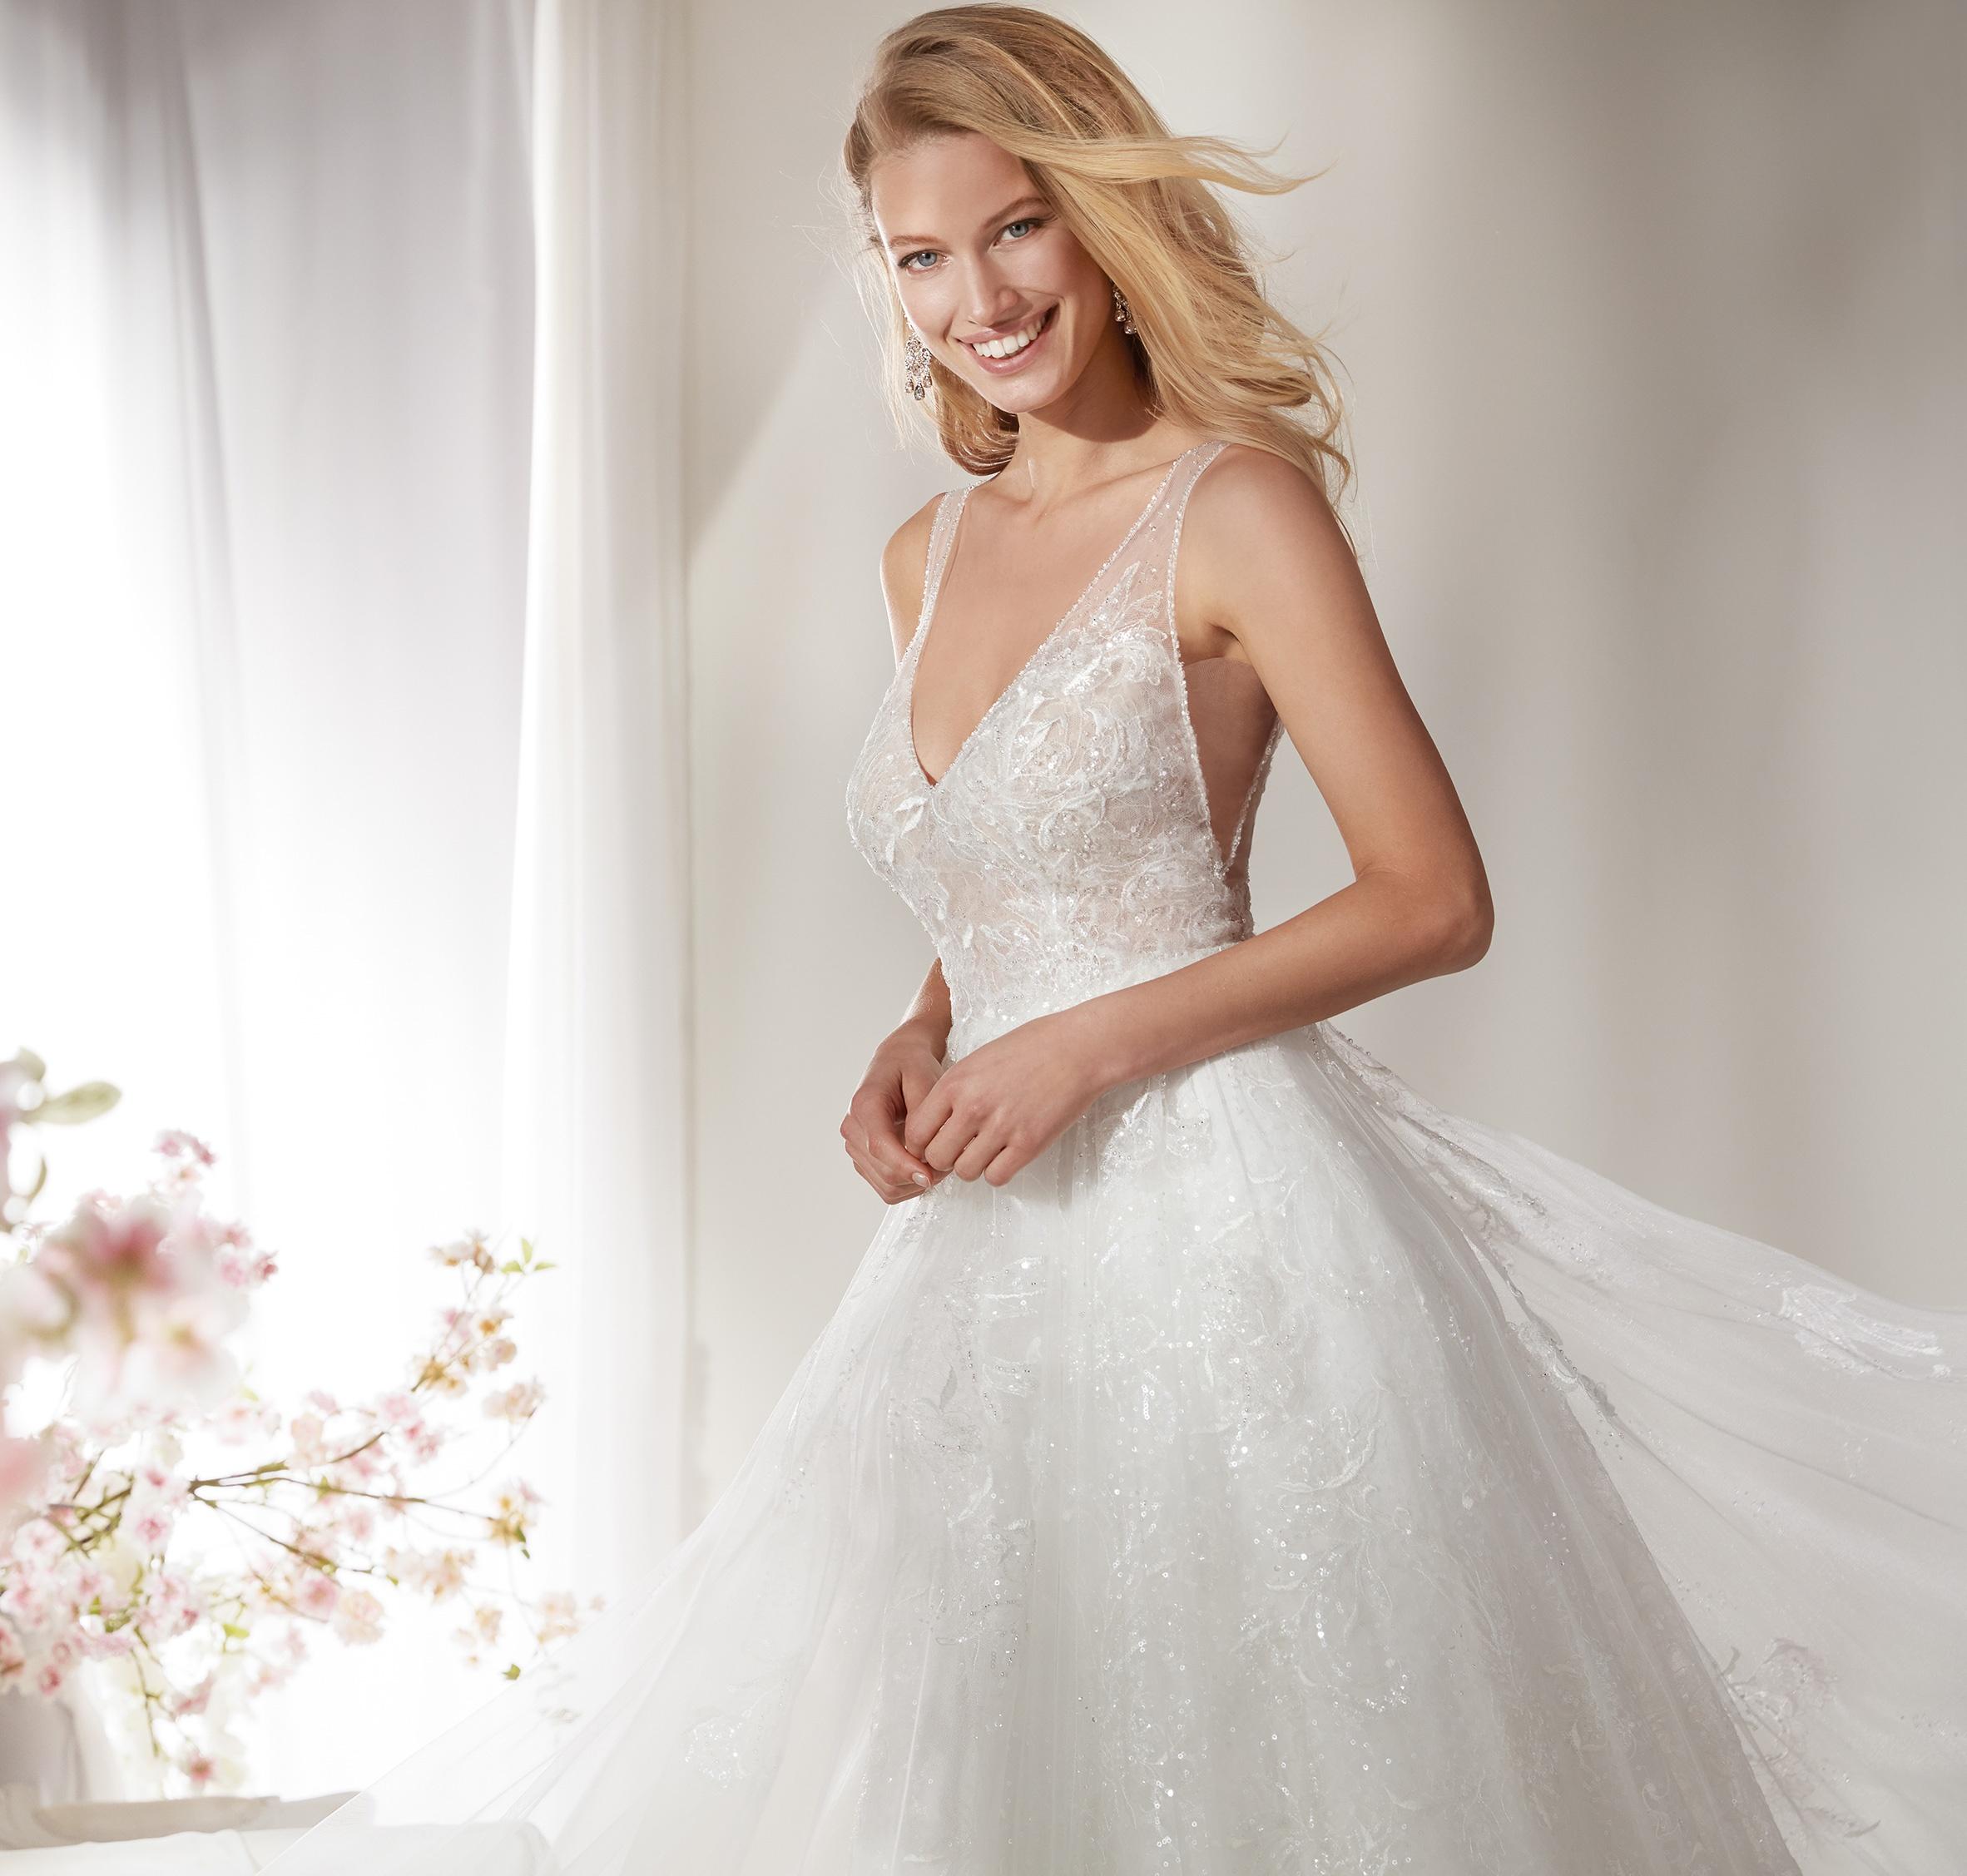 nicole-spose-COAB19258-Colet-moda-sposa-2019-185.jpg